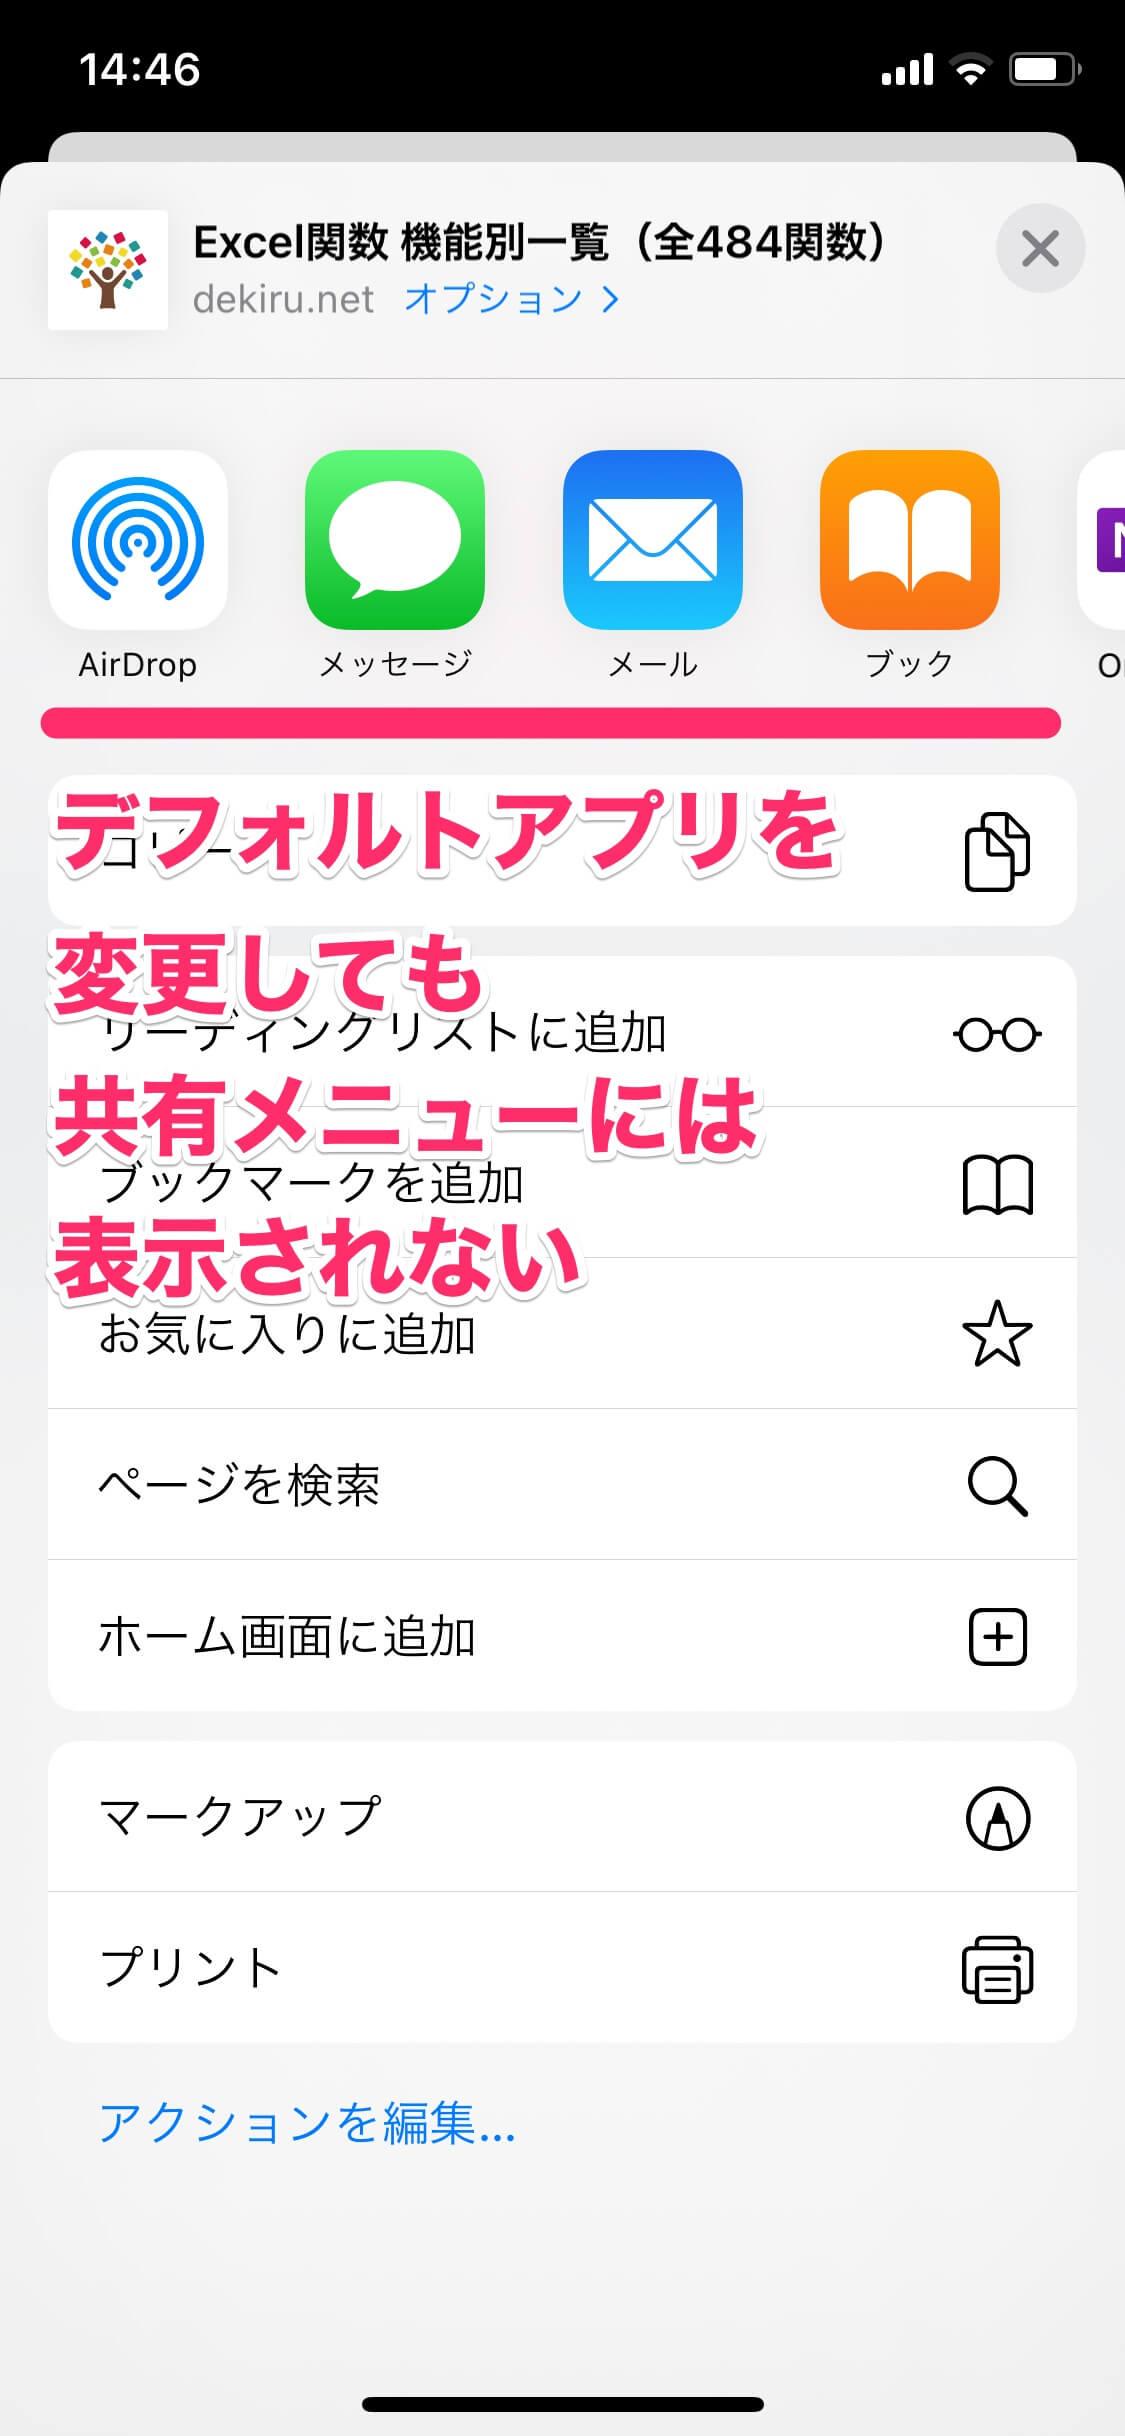 【iOS 14】デフォルトのブラウザー/メールアプリを変更する方法。Chrome/Gmailを常に使える